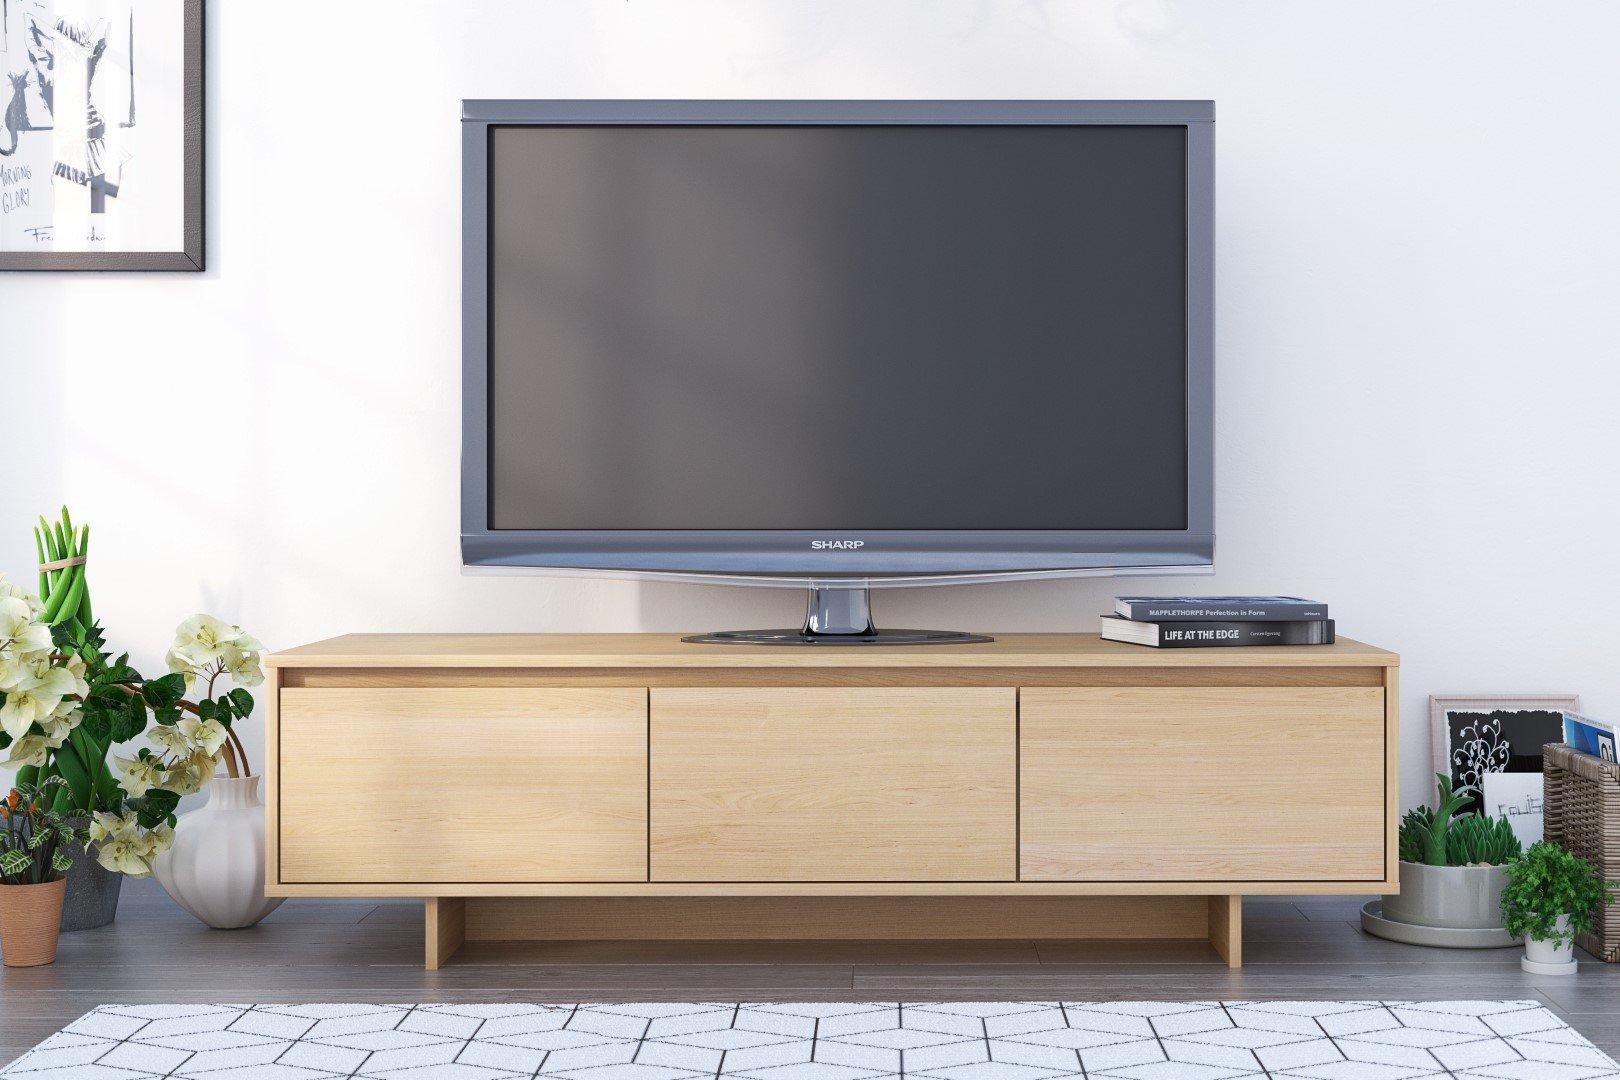 Nexera Rustik TV Stand, 60'', Natural Maple by Nexera